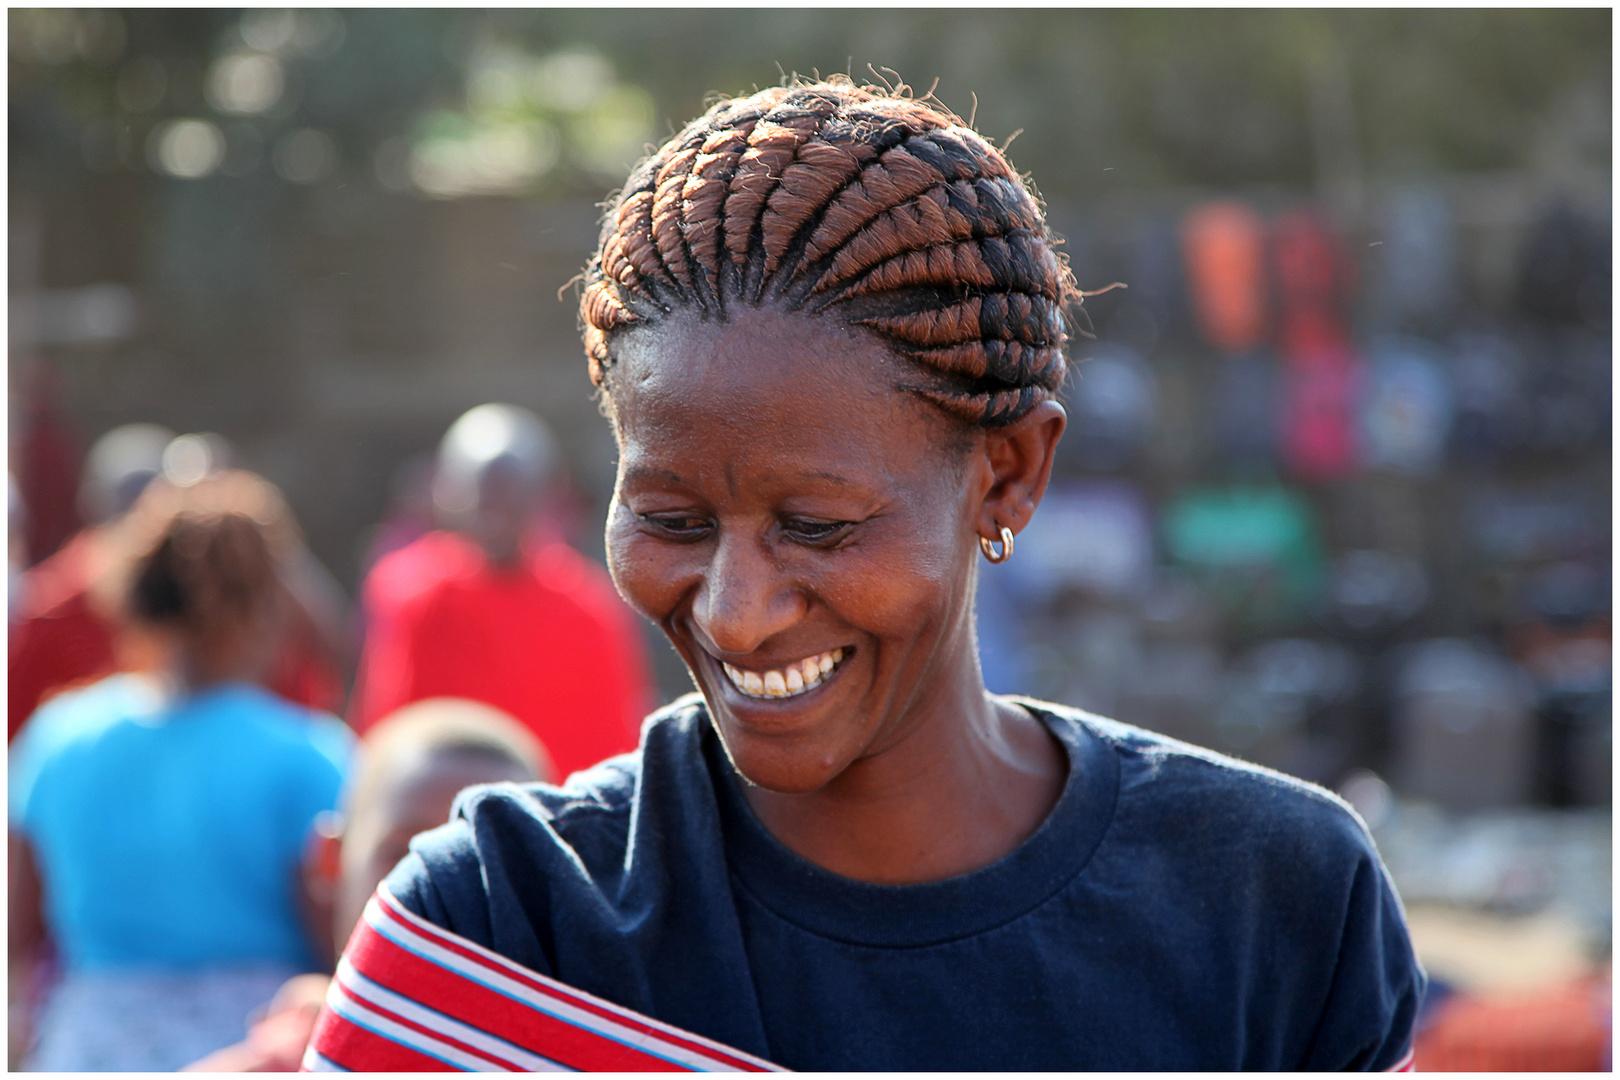 -Marktfrau- Tansania 2013